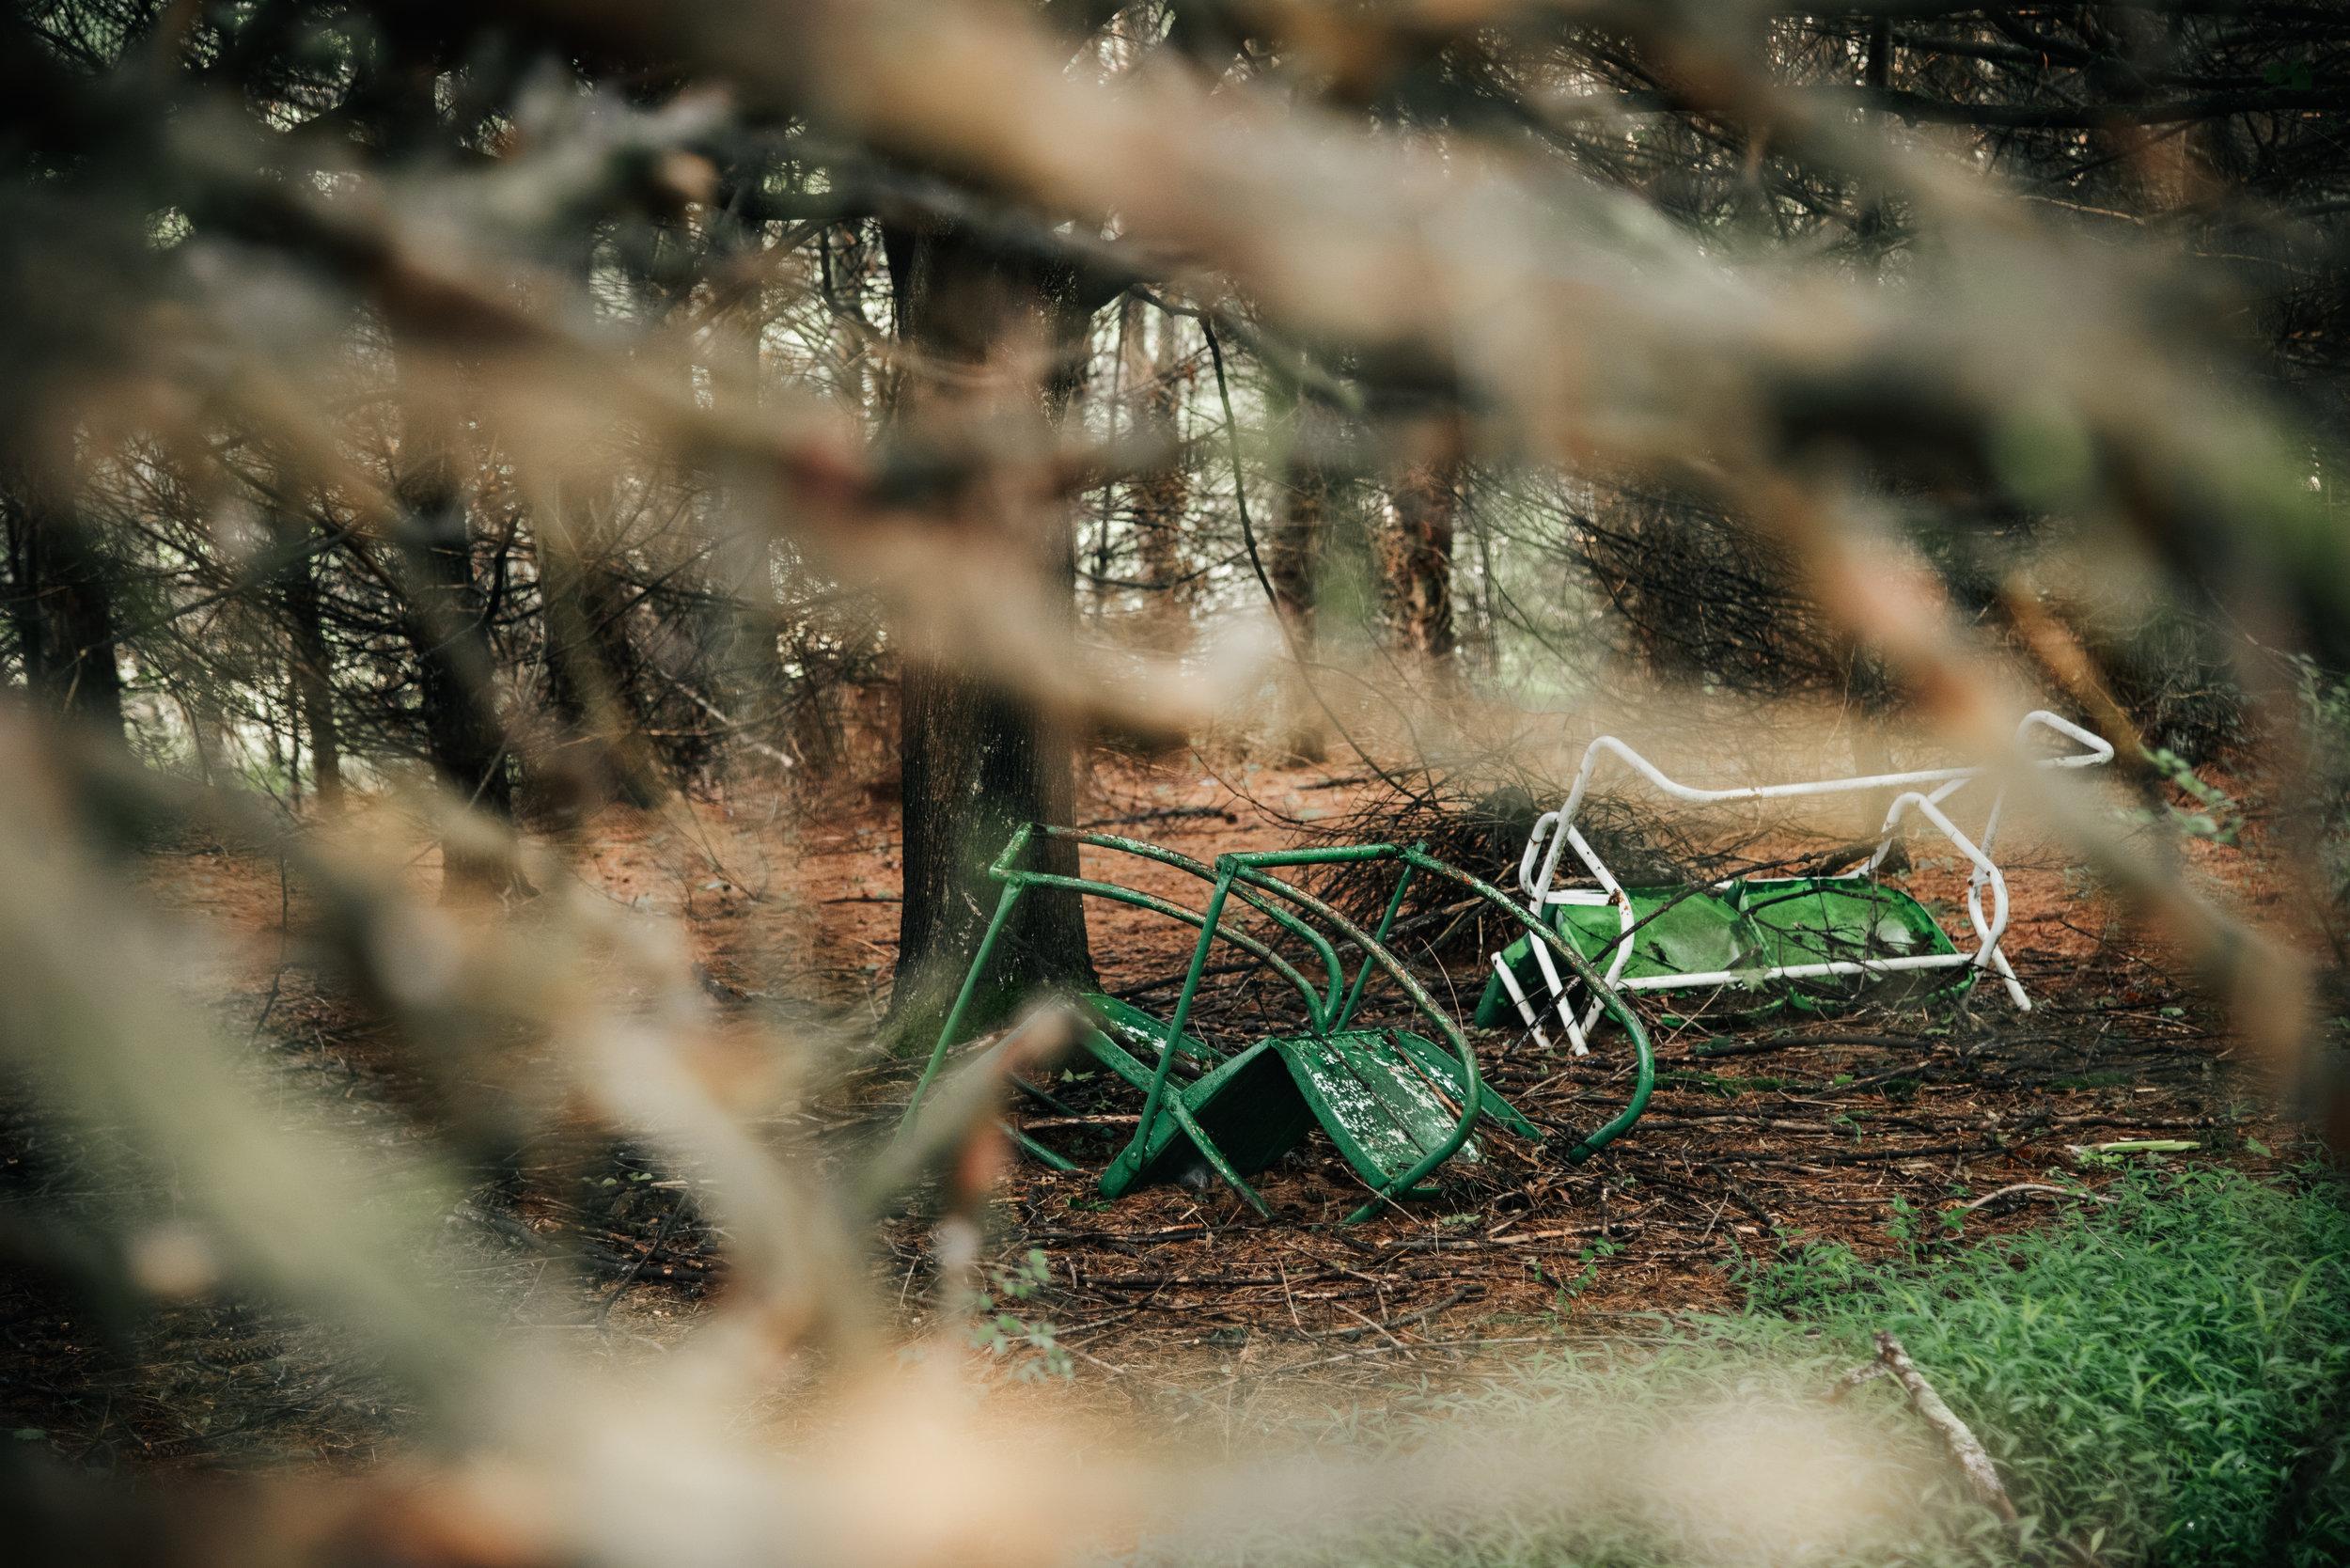 kw-forest-findings-vol2-img9.jpg